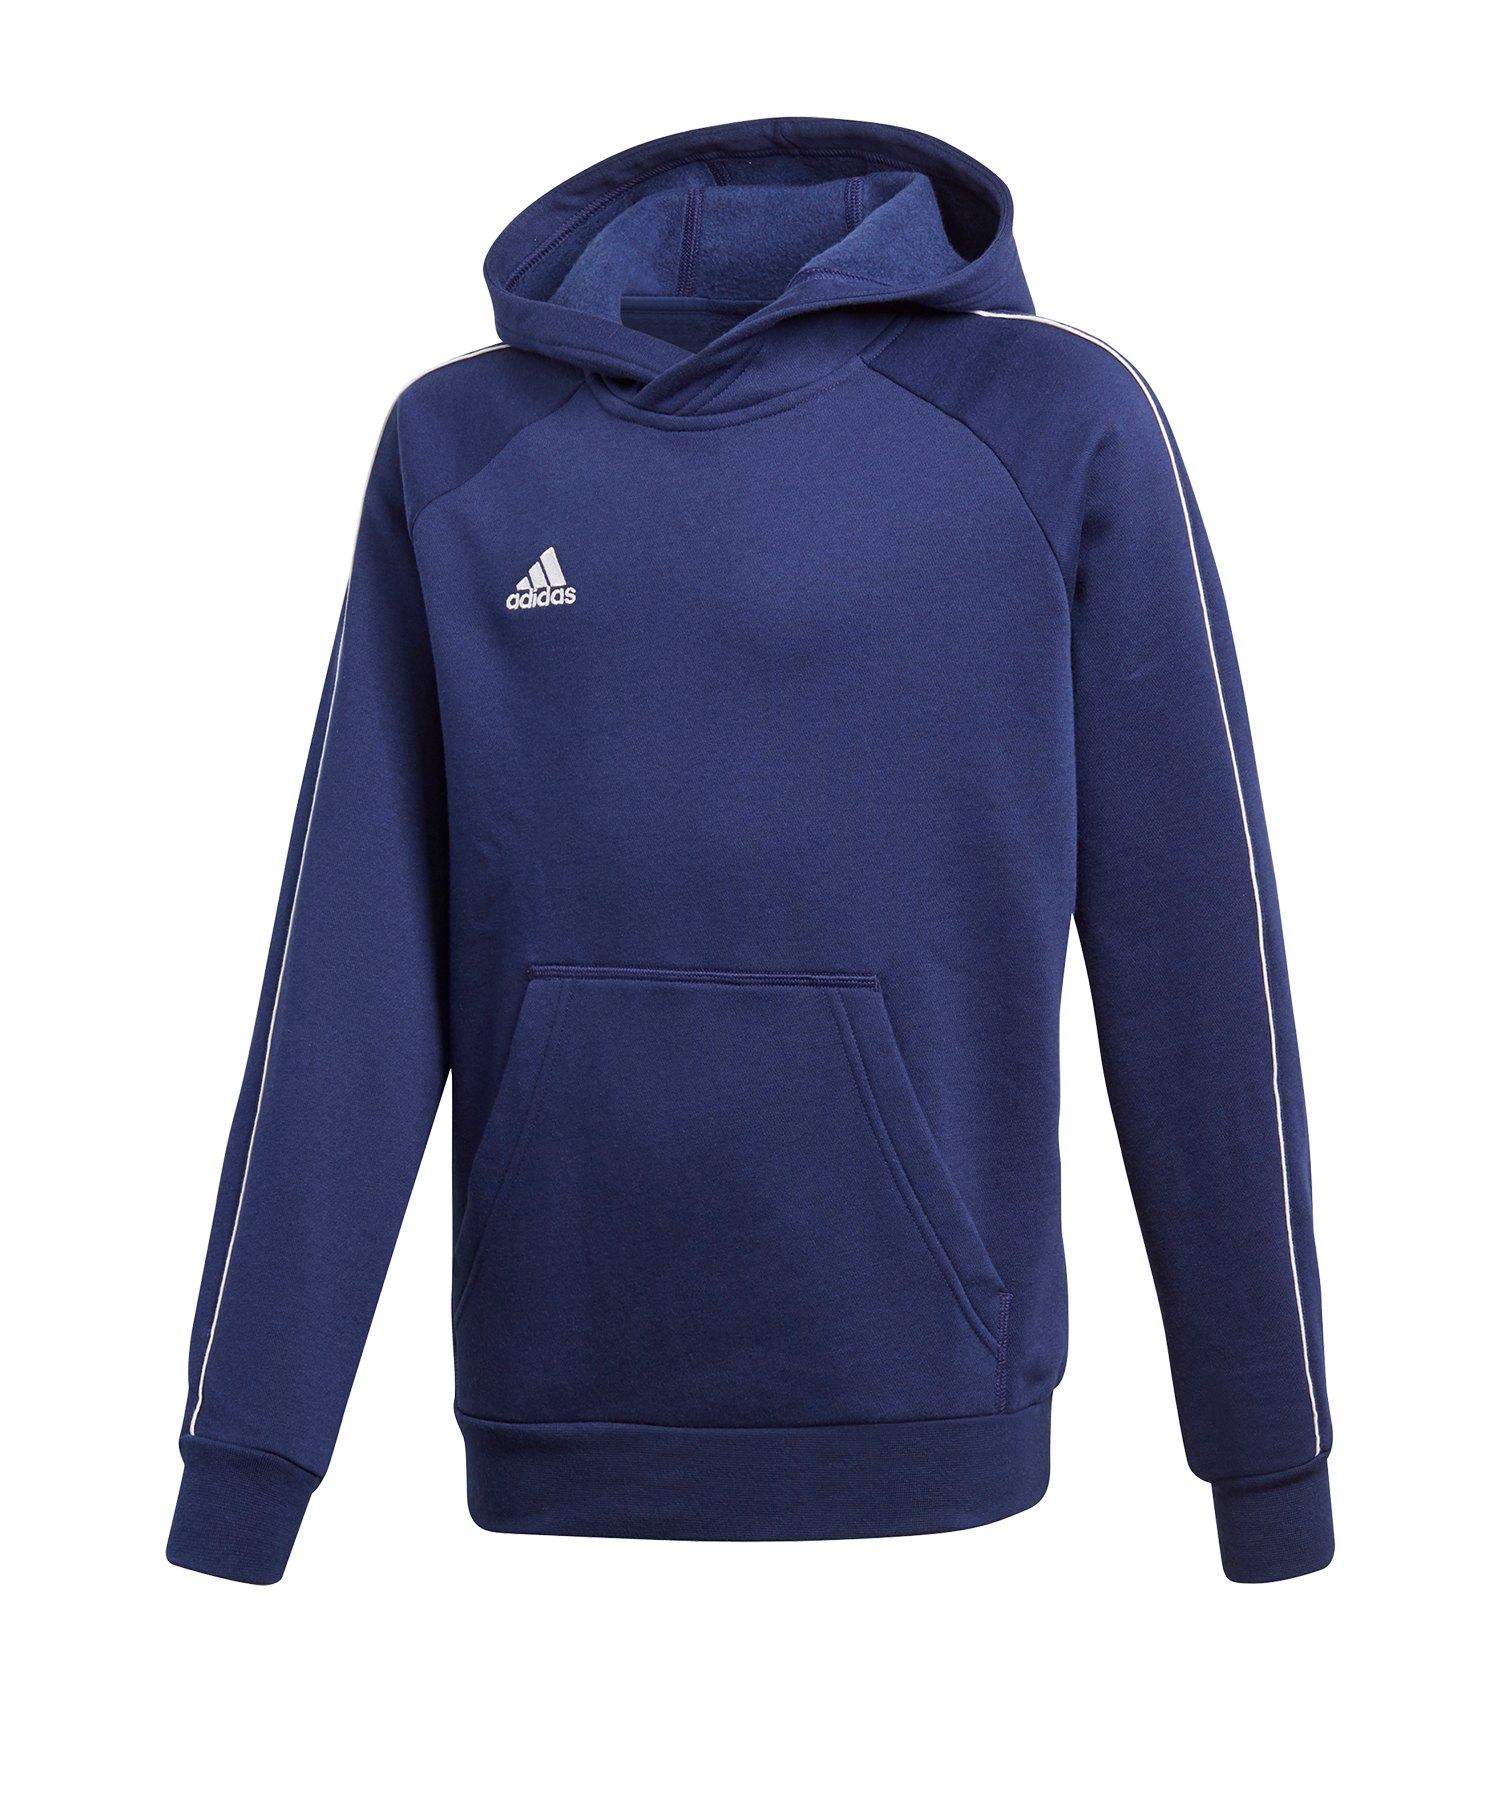 adidas Core 18 Hoody Kapuzensweatshirt Kids Blau - blau